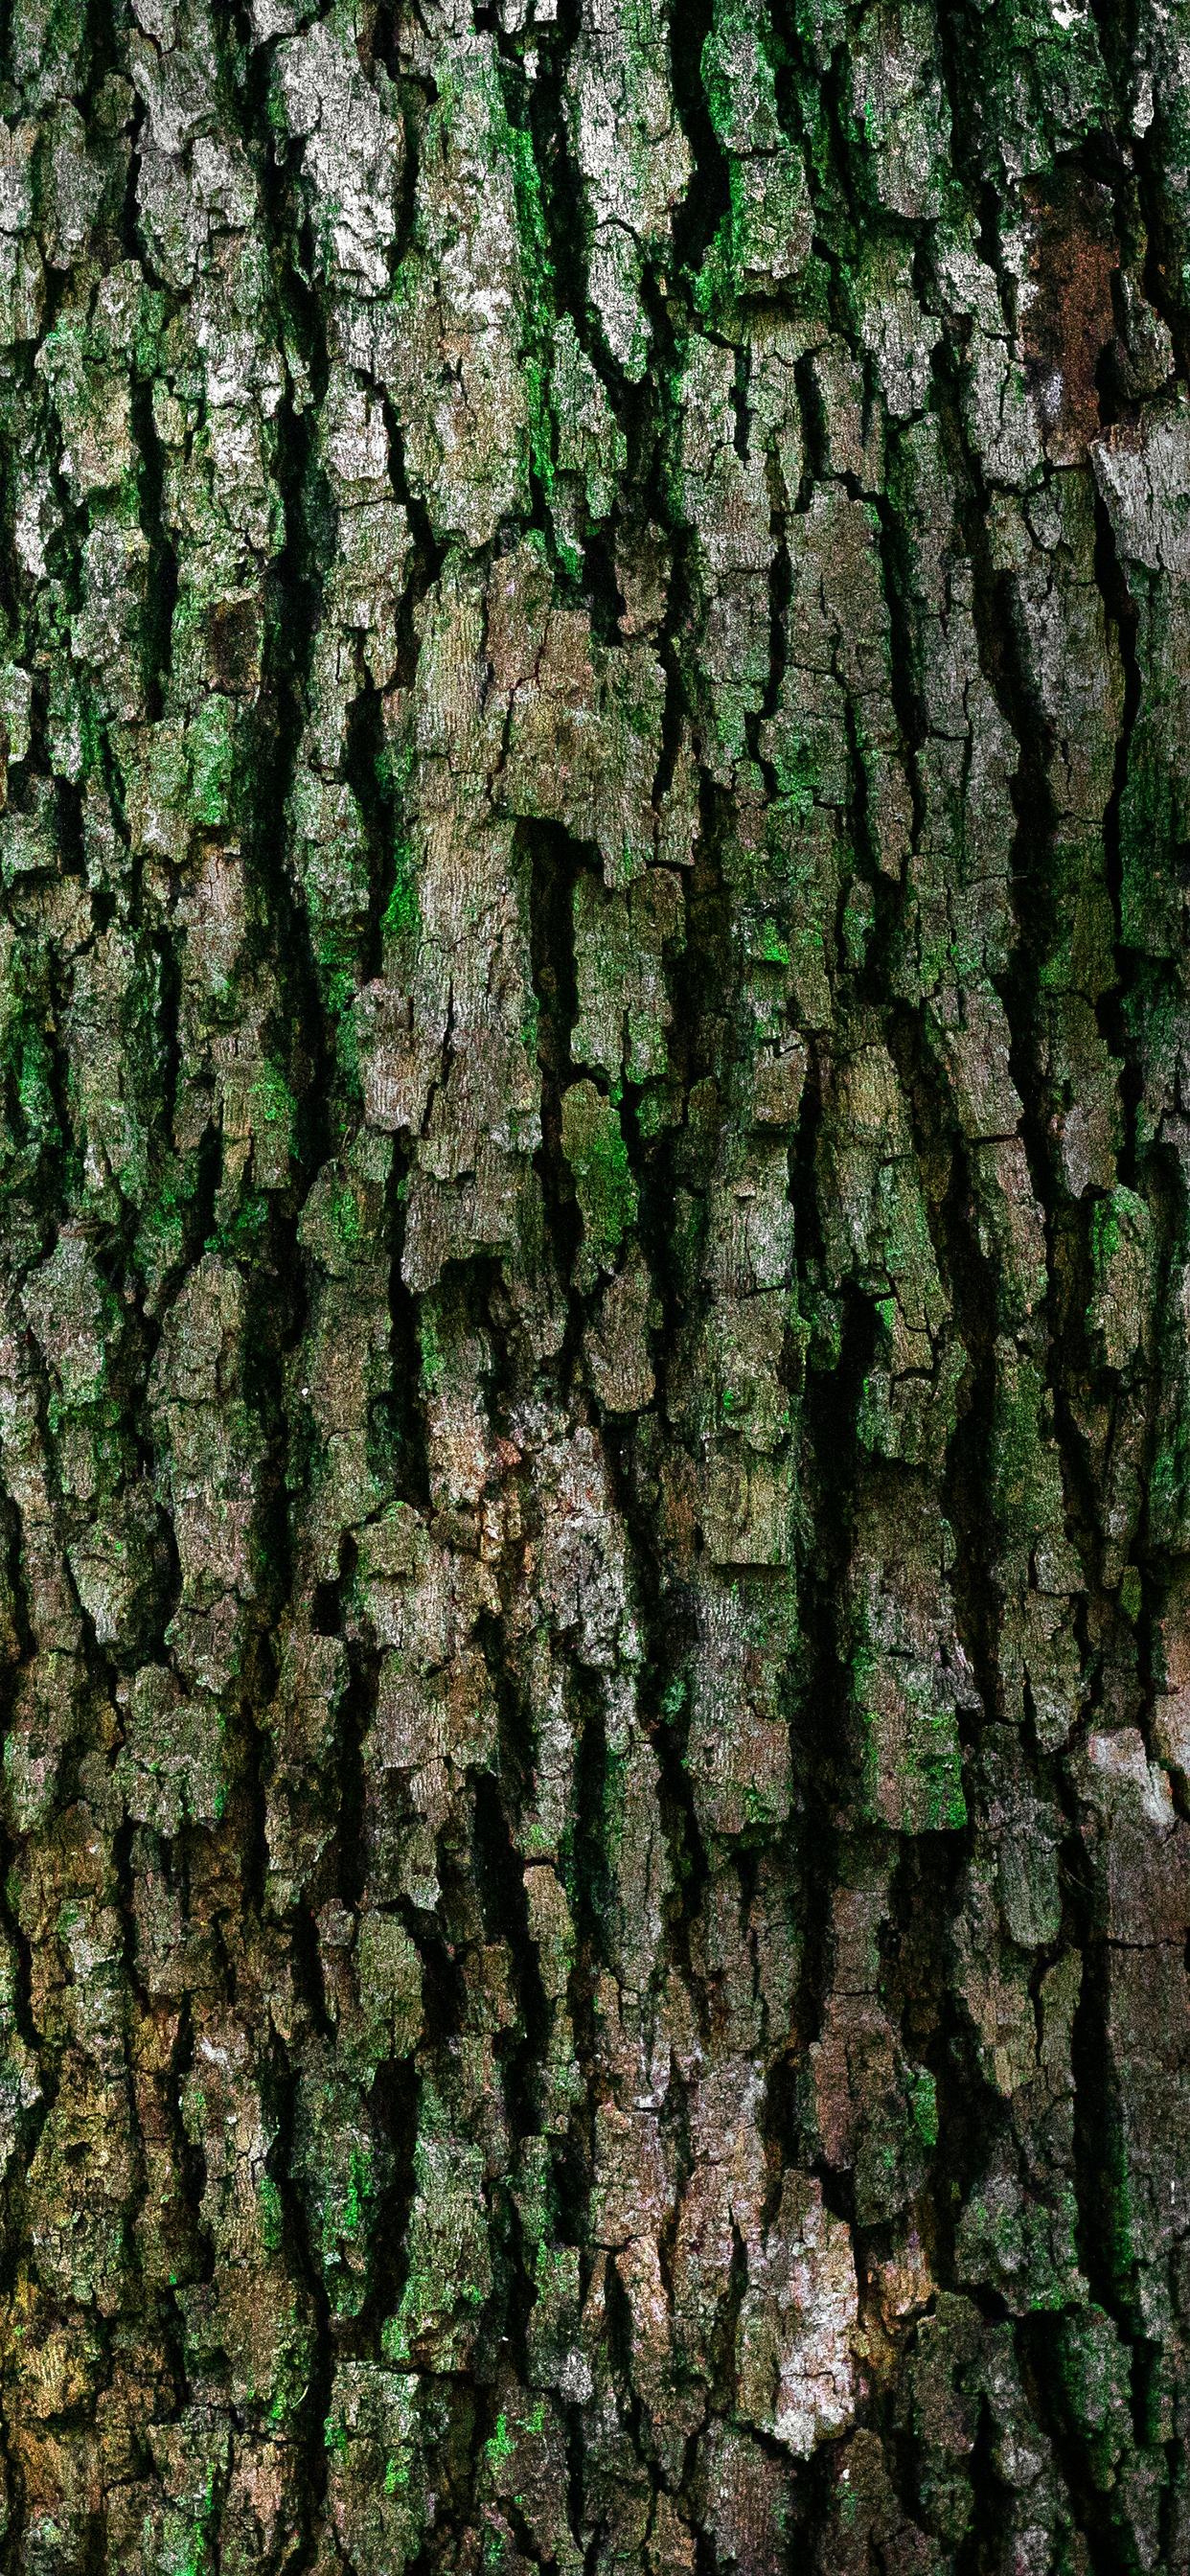 iPhone wallpaper cortex texture green Cortex